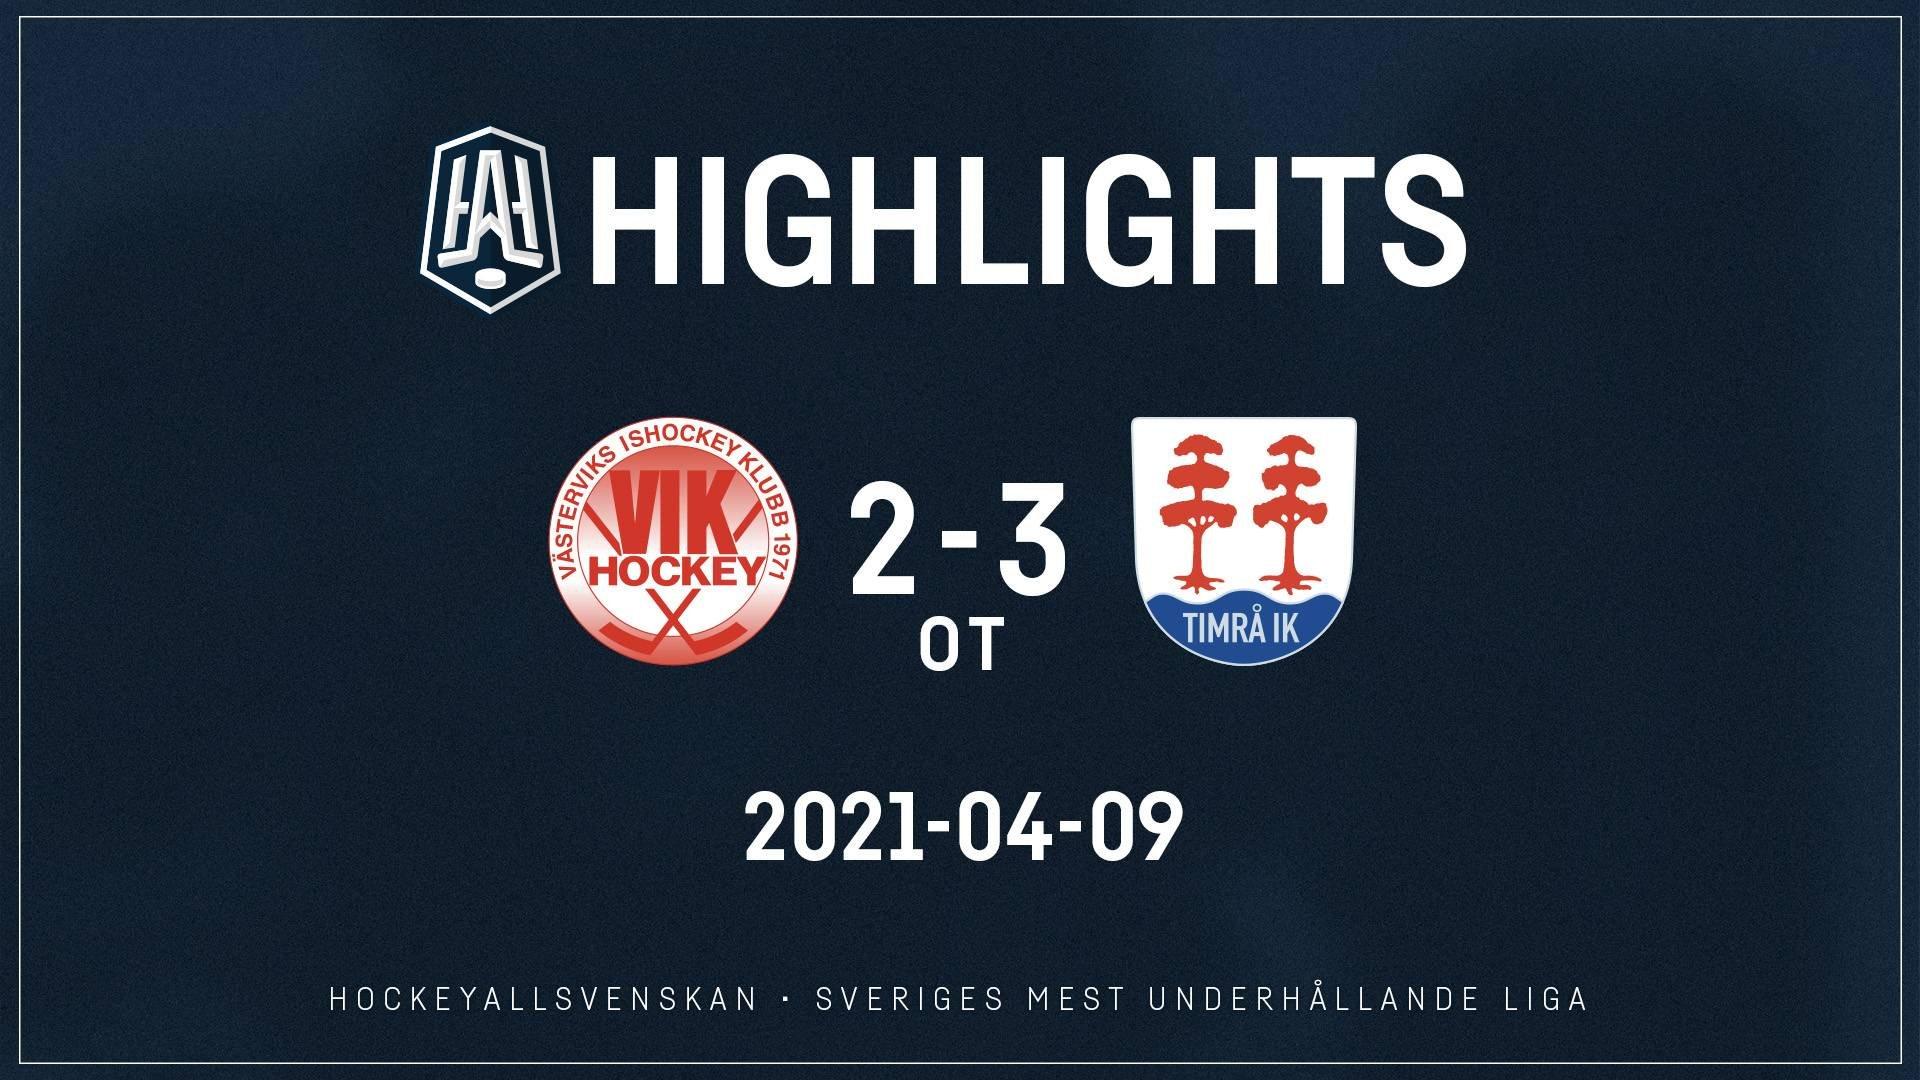 2021-04-09 Västervik - Timrå 2-3 (OT)